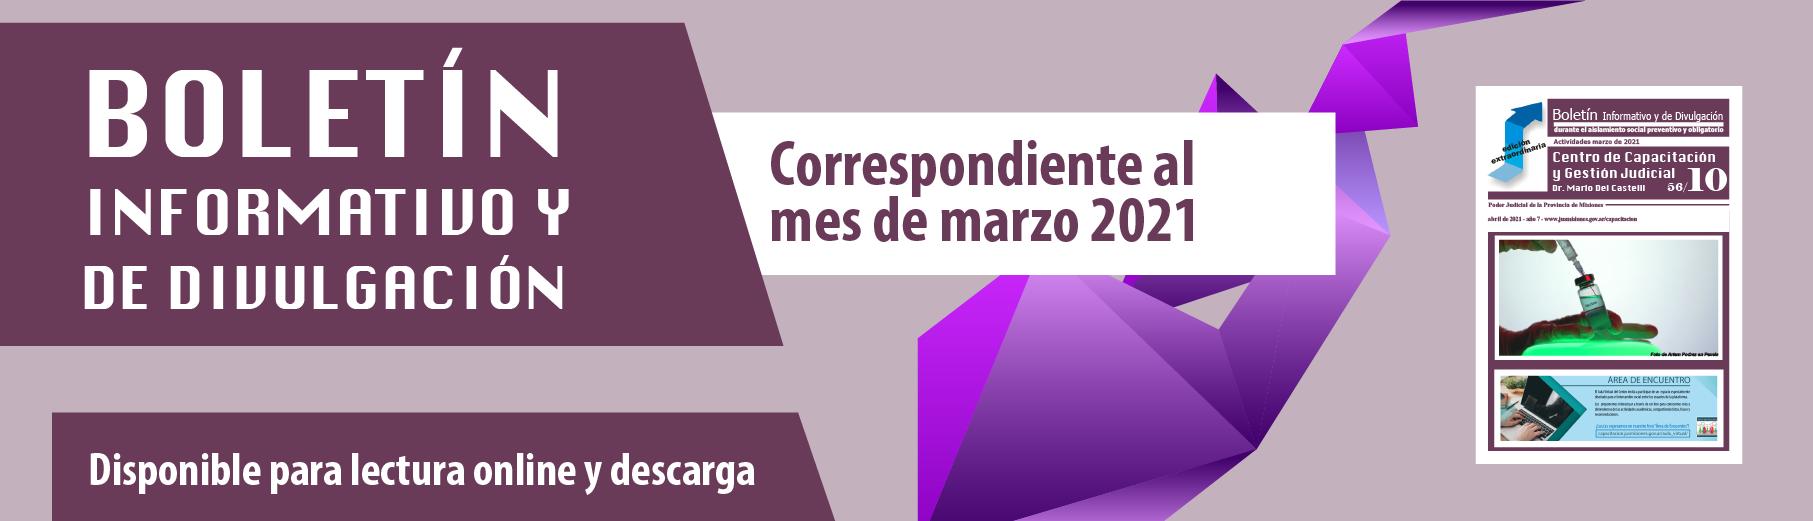 Boletín Informativo de marzo 2021